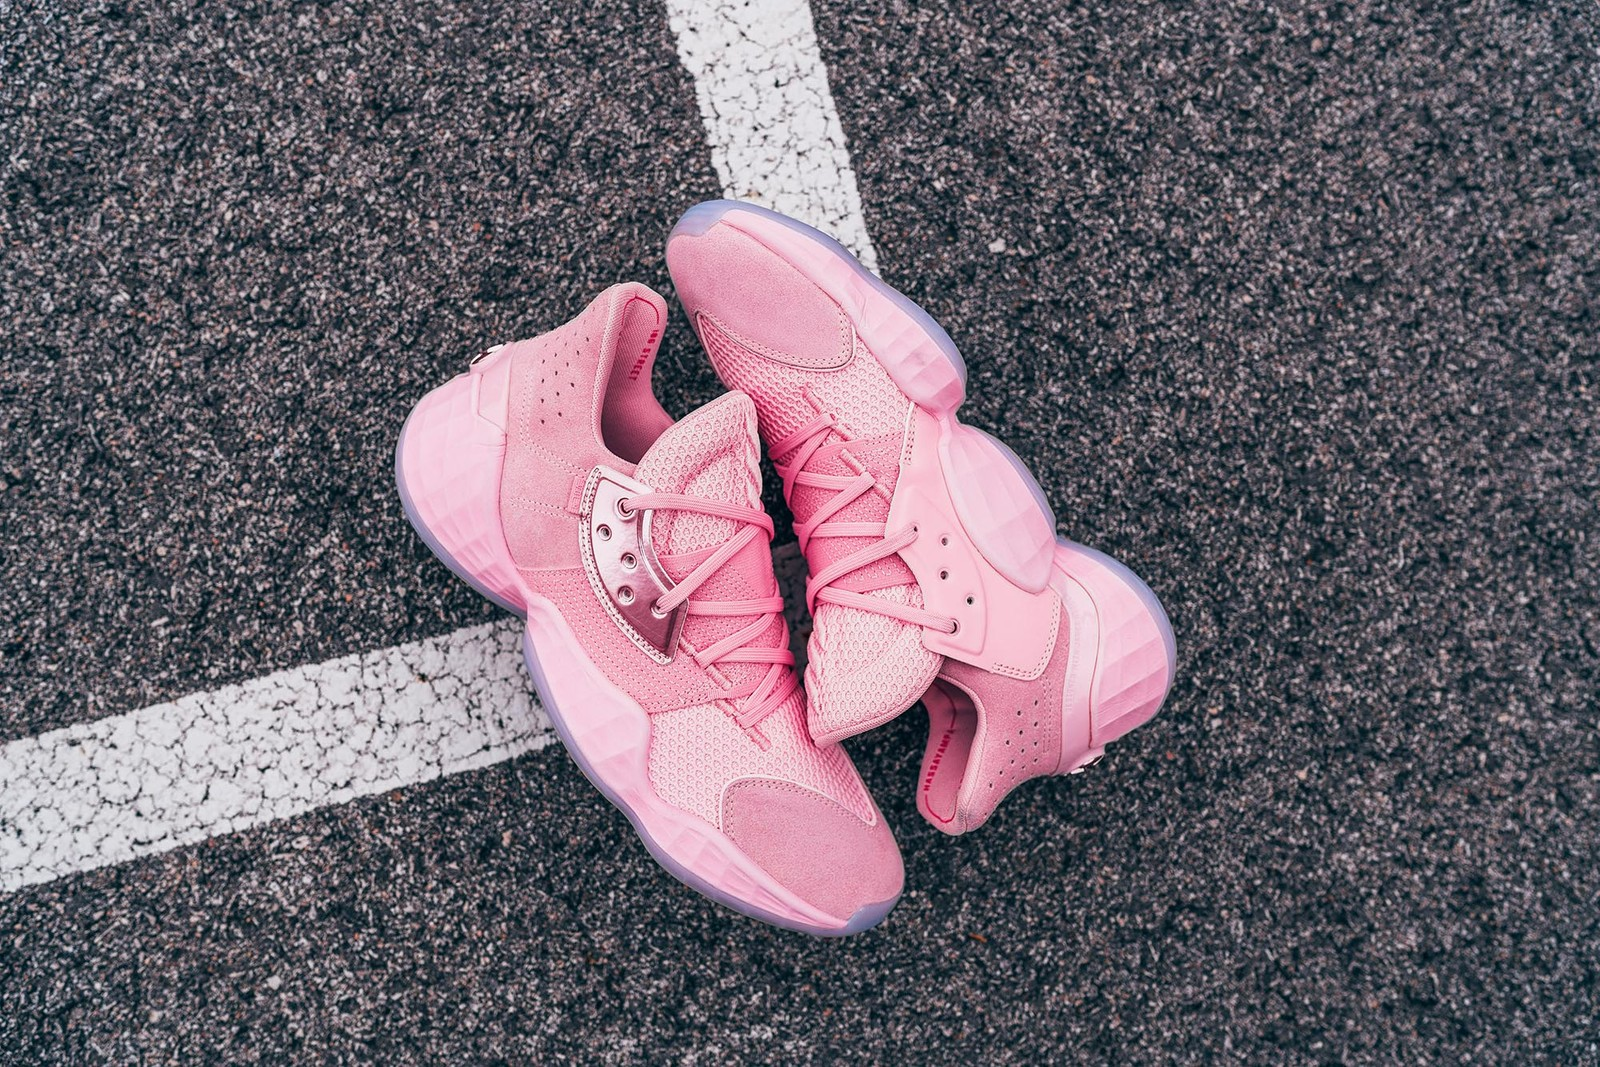 adidas Harden Vol. 4 不可錯過的首發配色釋出 Pink Lemonade 和 Barbershop